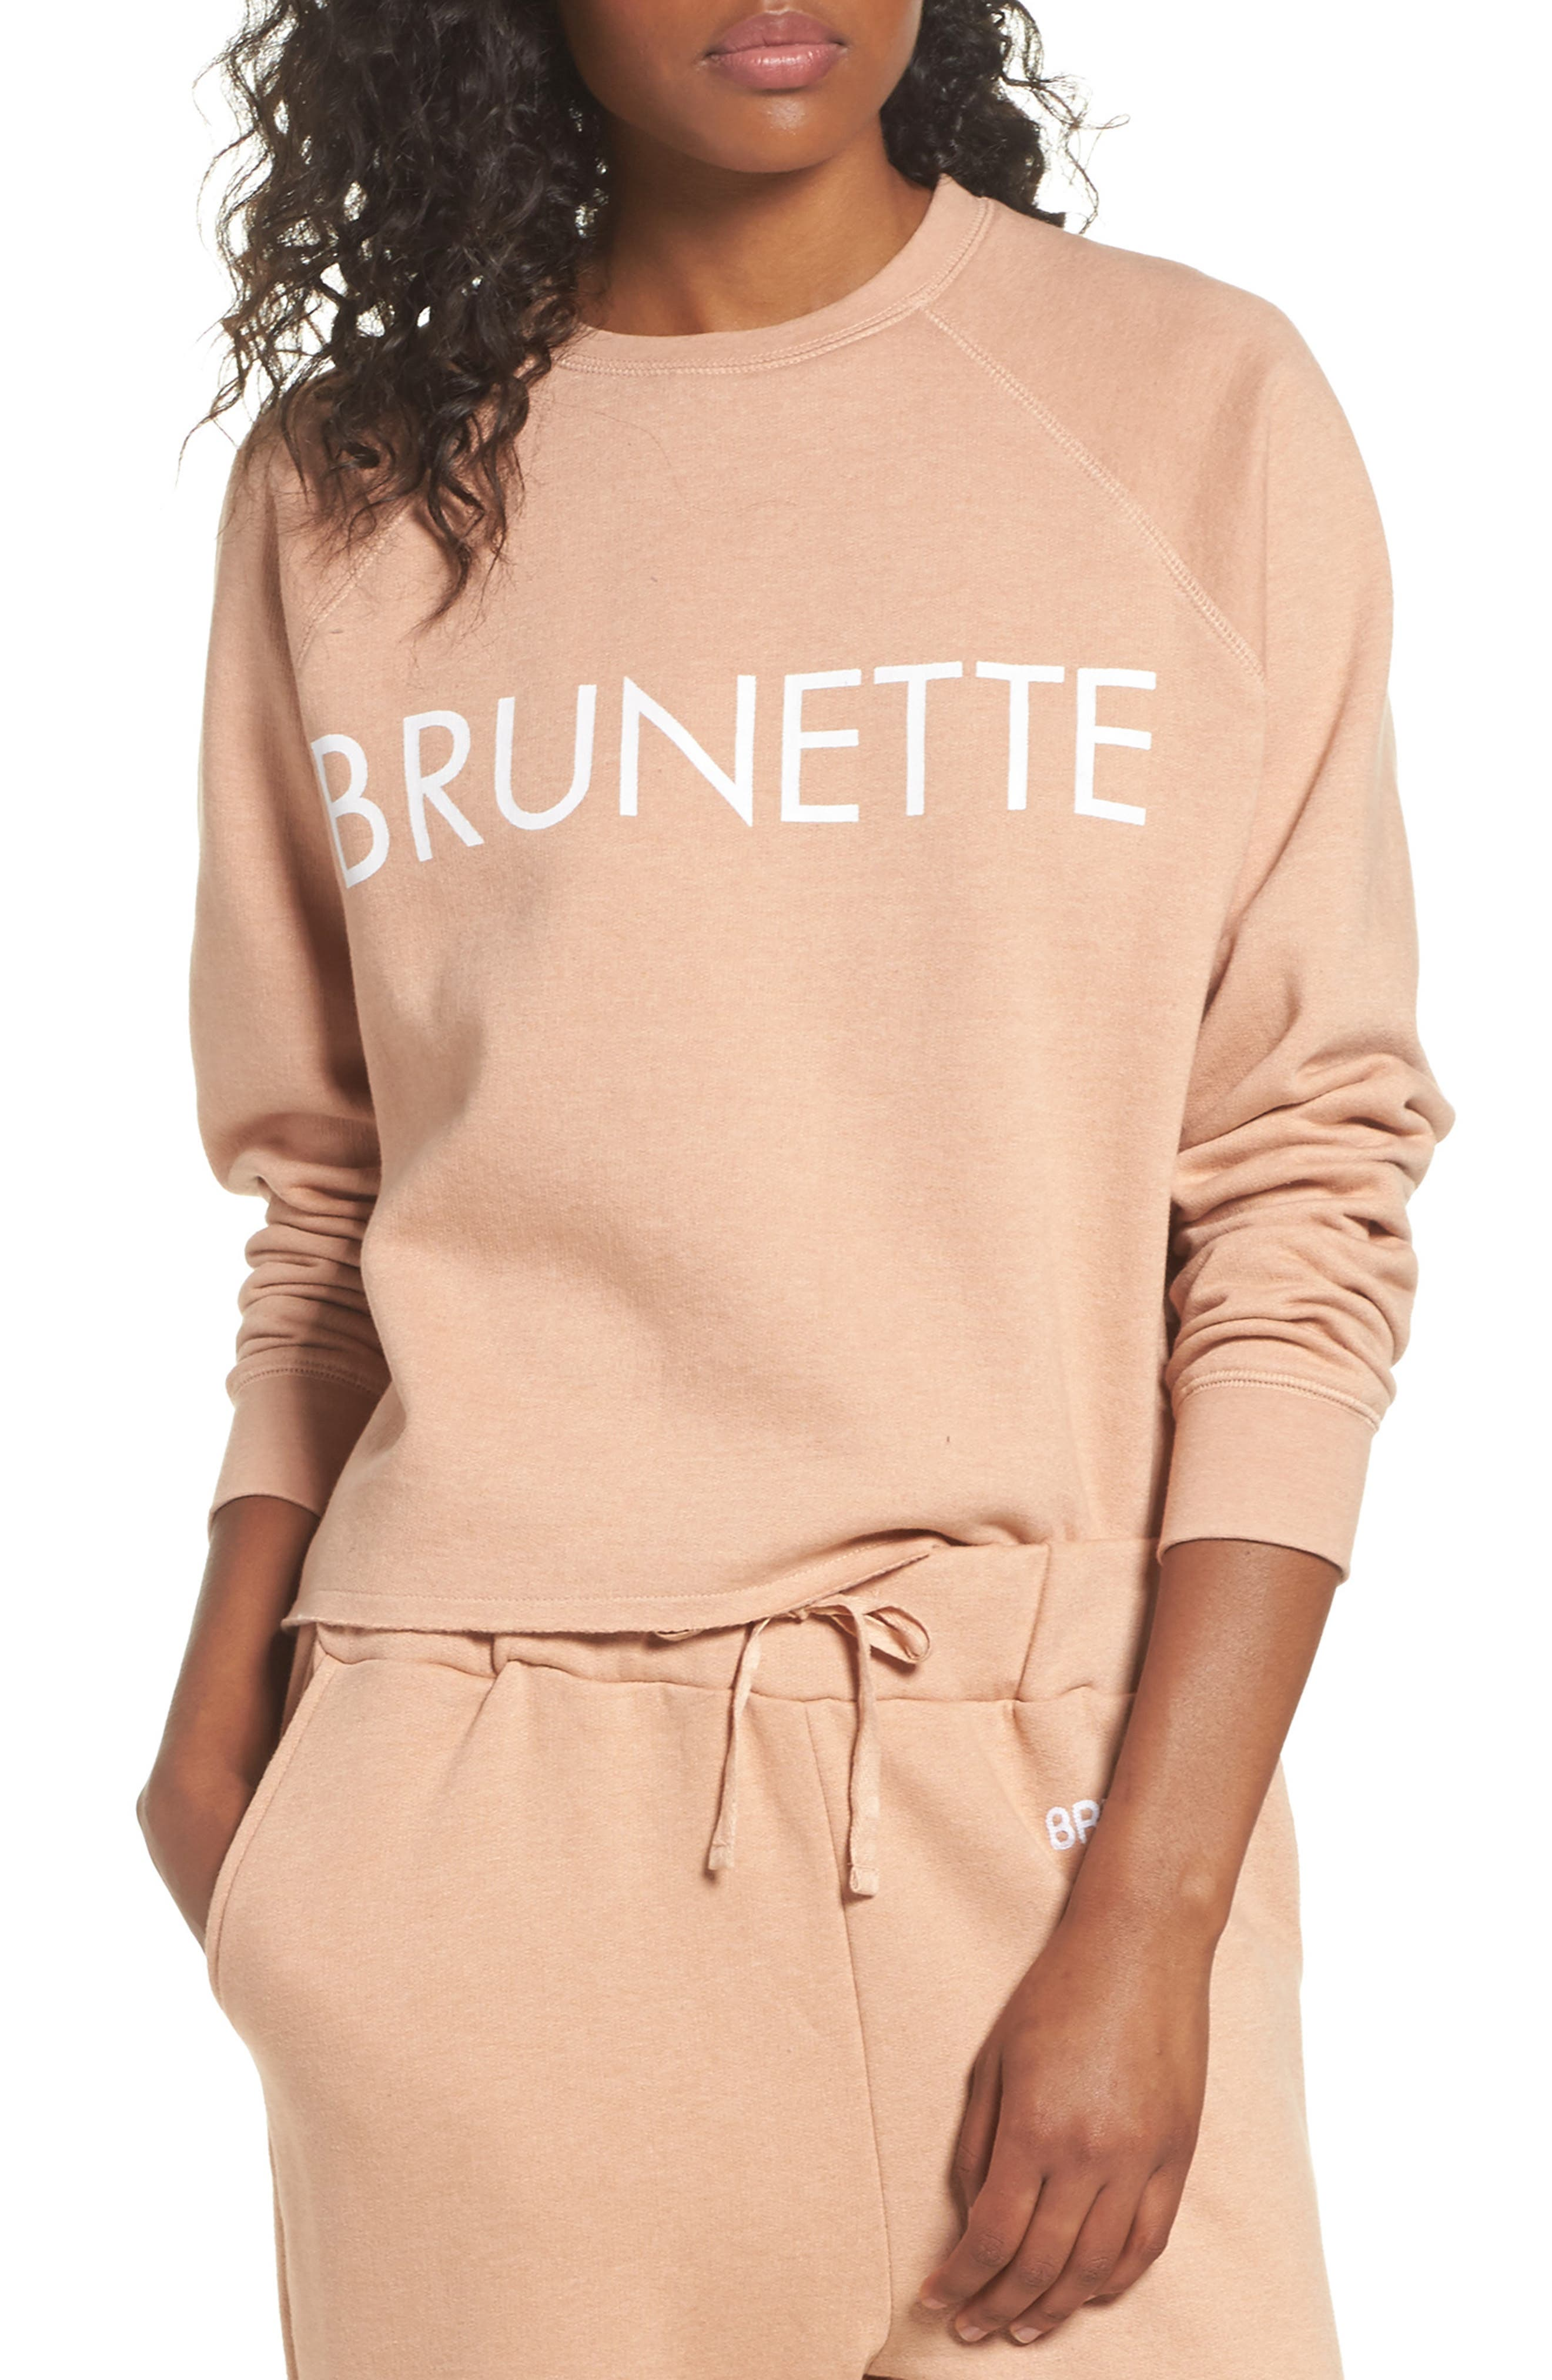 Middle Sister Brunette Sweatshirt,                         Main,                         color, 950